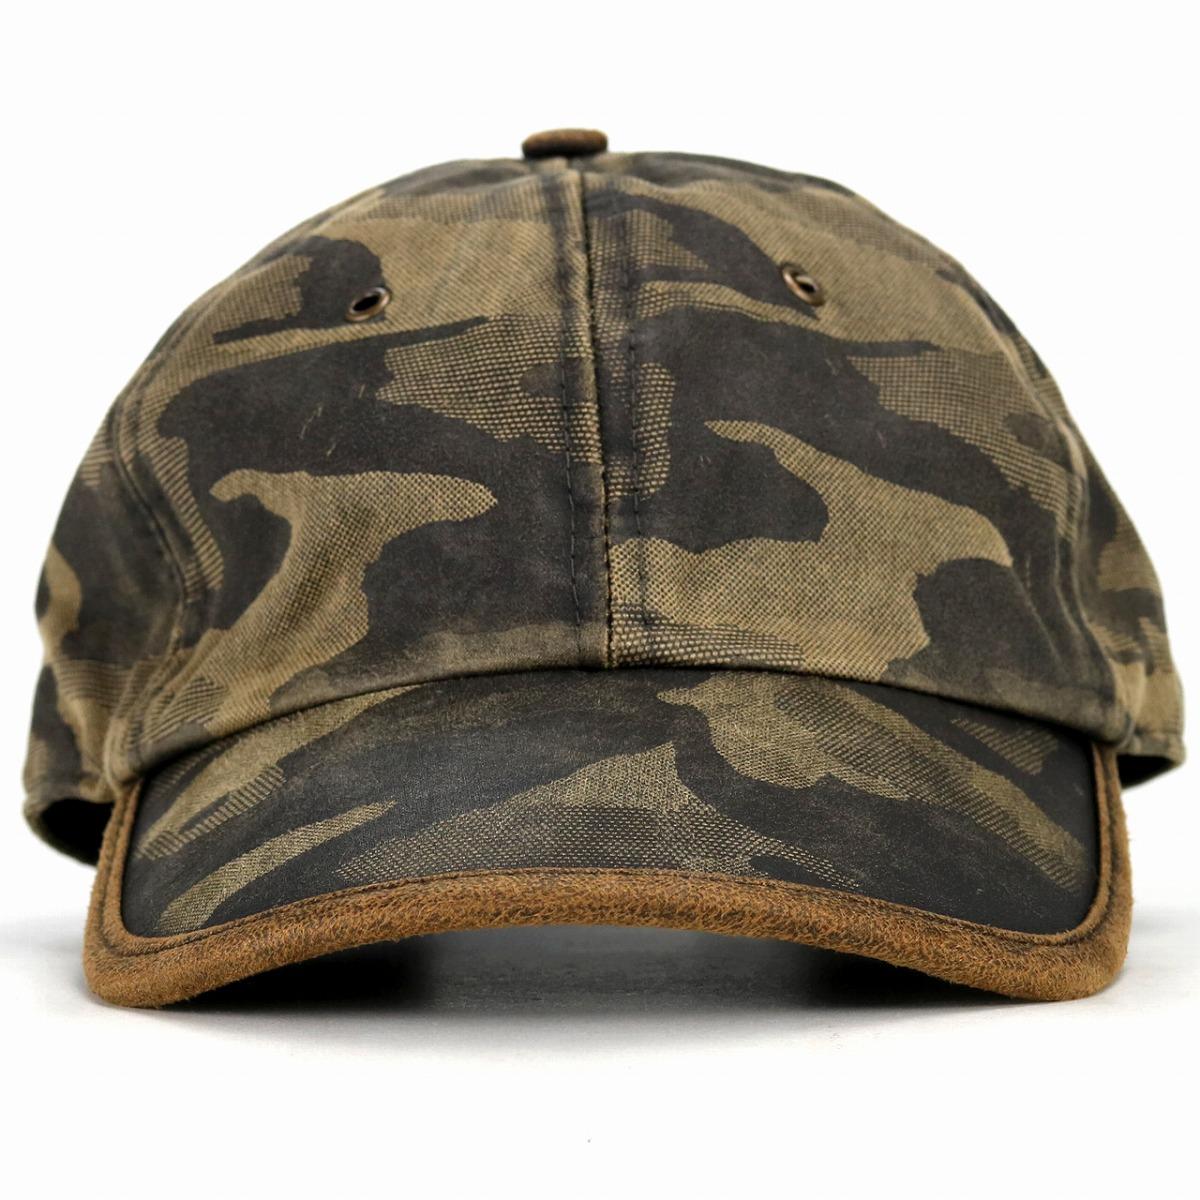 Original Russian army baseball cap in Syria